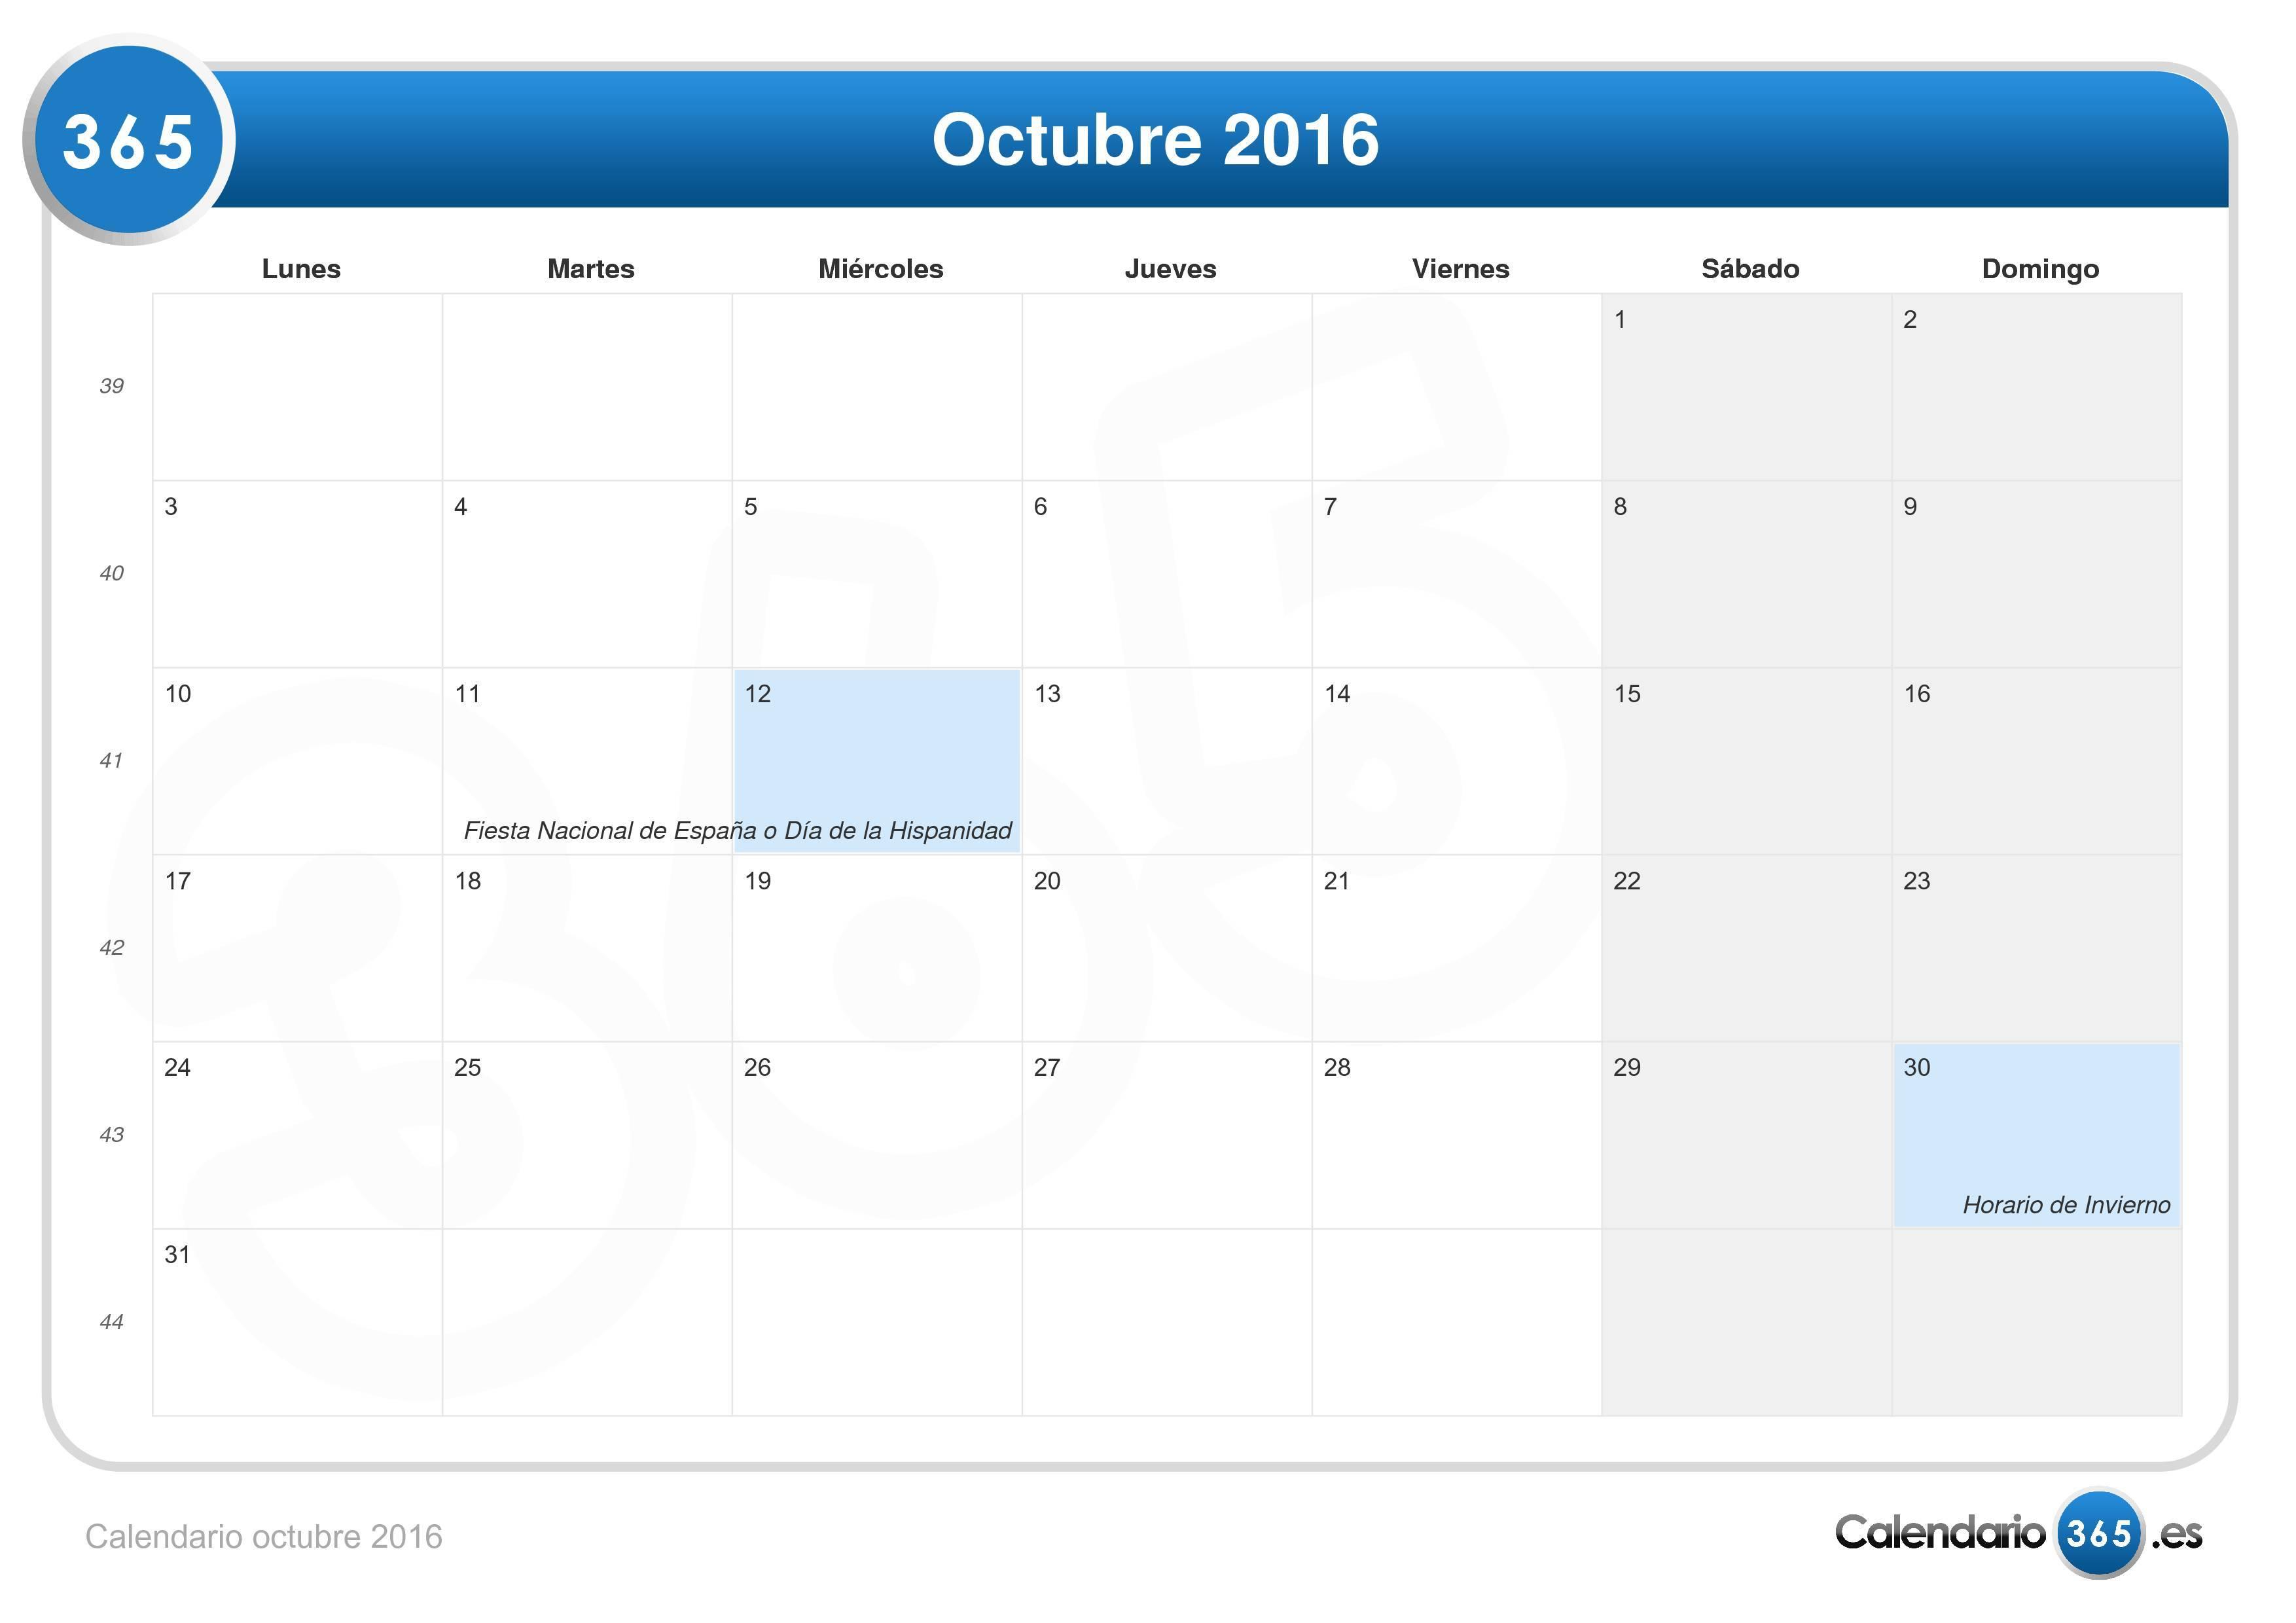 Calendario octubre 2016